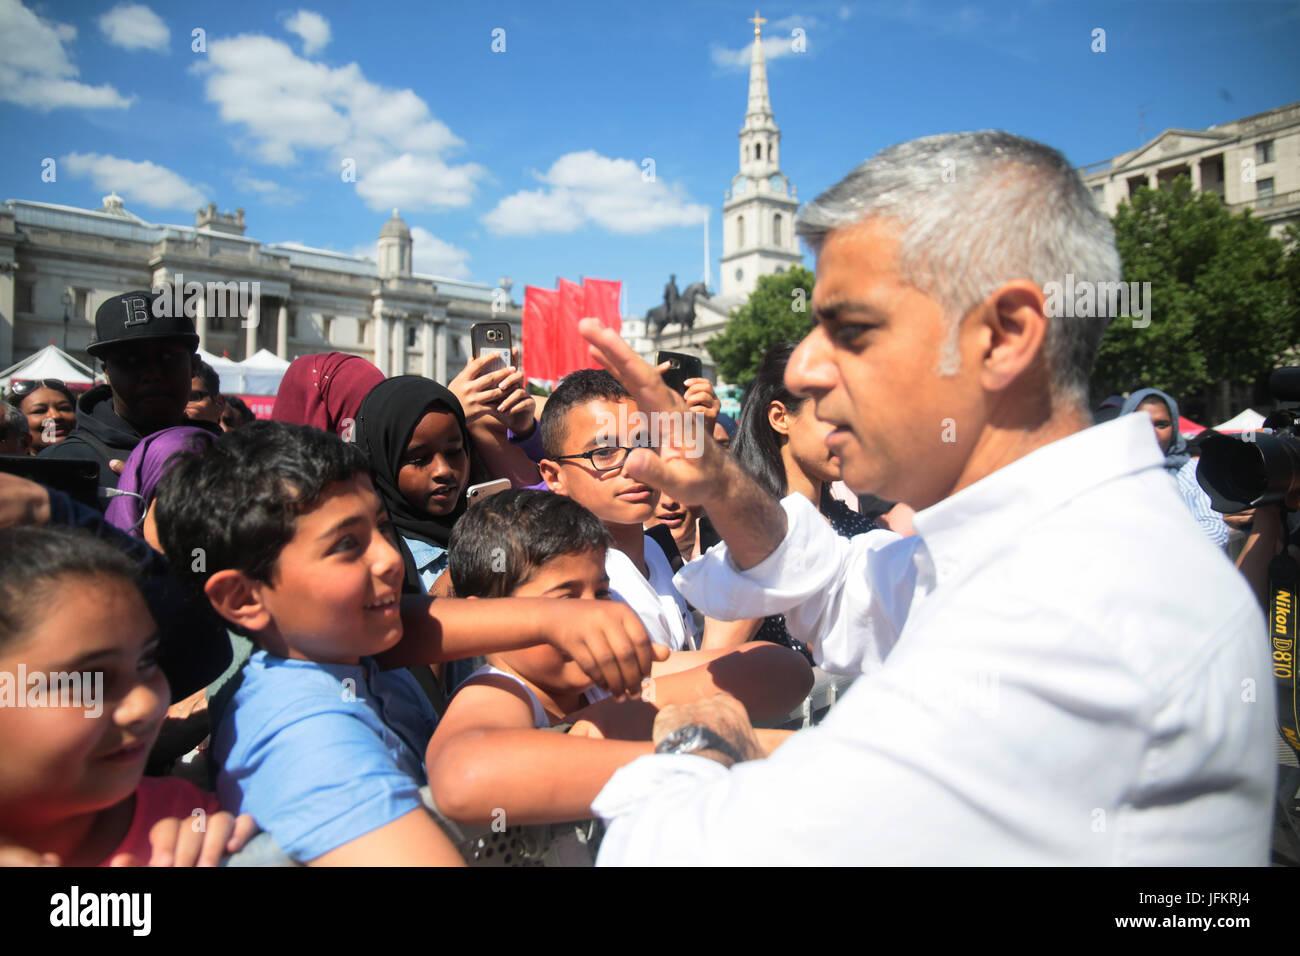 London, UK. 2nd July, 2017. Eid celebrations saw the London Mayor Sadiq Khan meeting some of the large crowd who - Stock Image